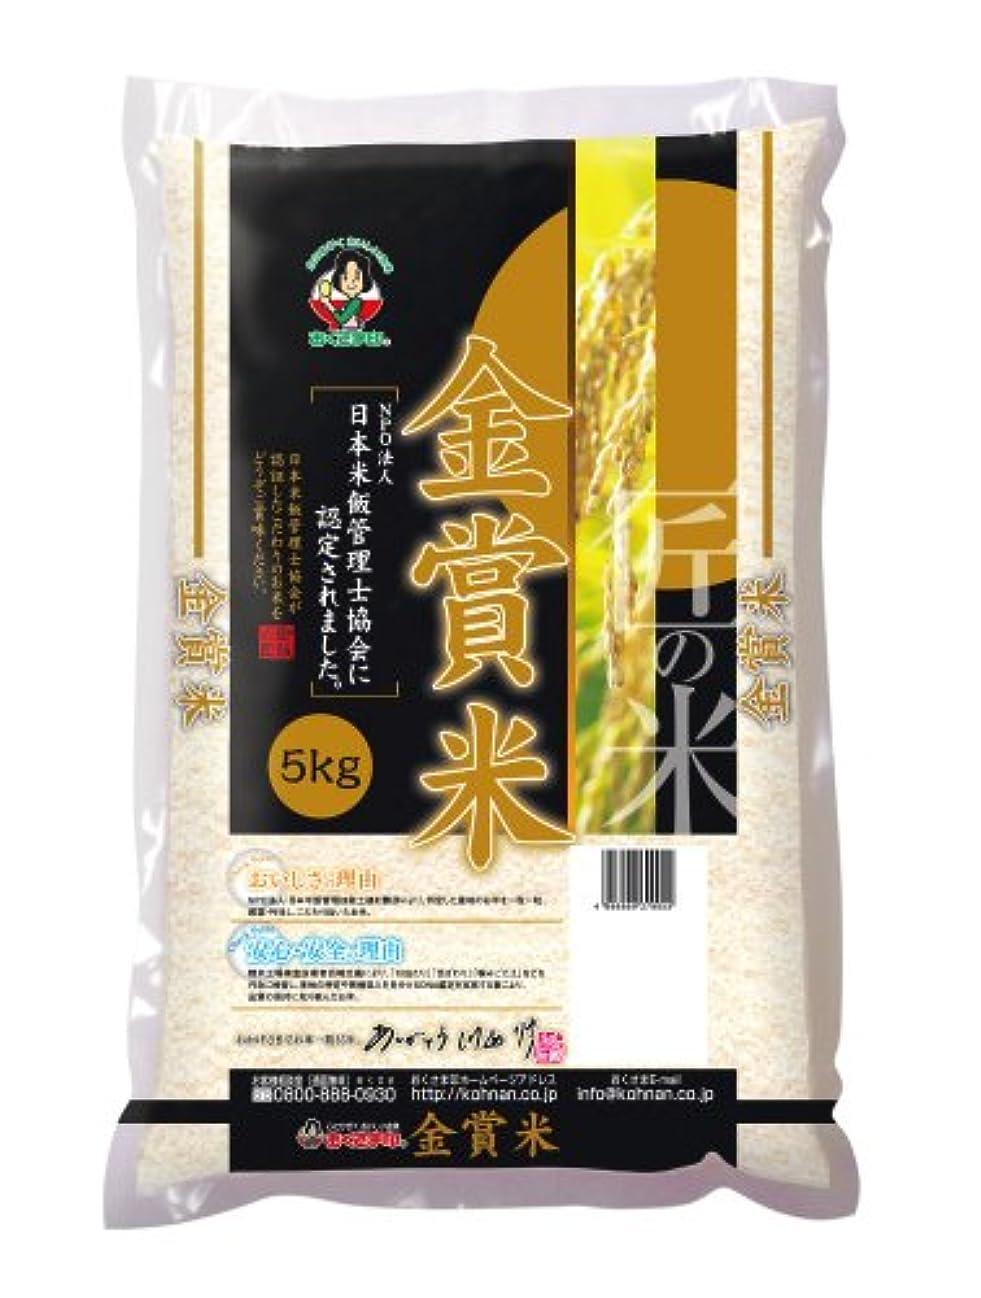 人気のディスコ放射能【精米】日本米飯管理士協会認定 金賞受賞米 5kg